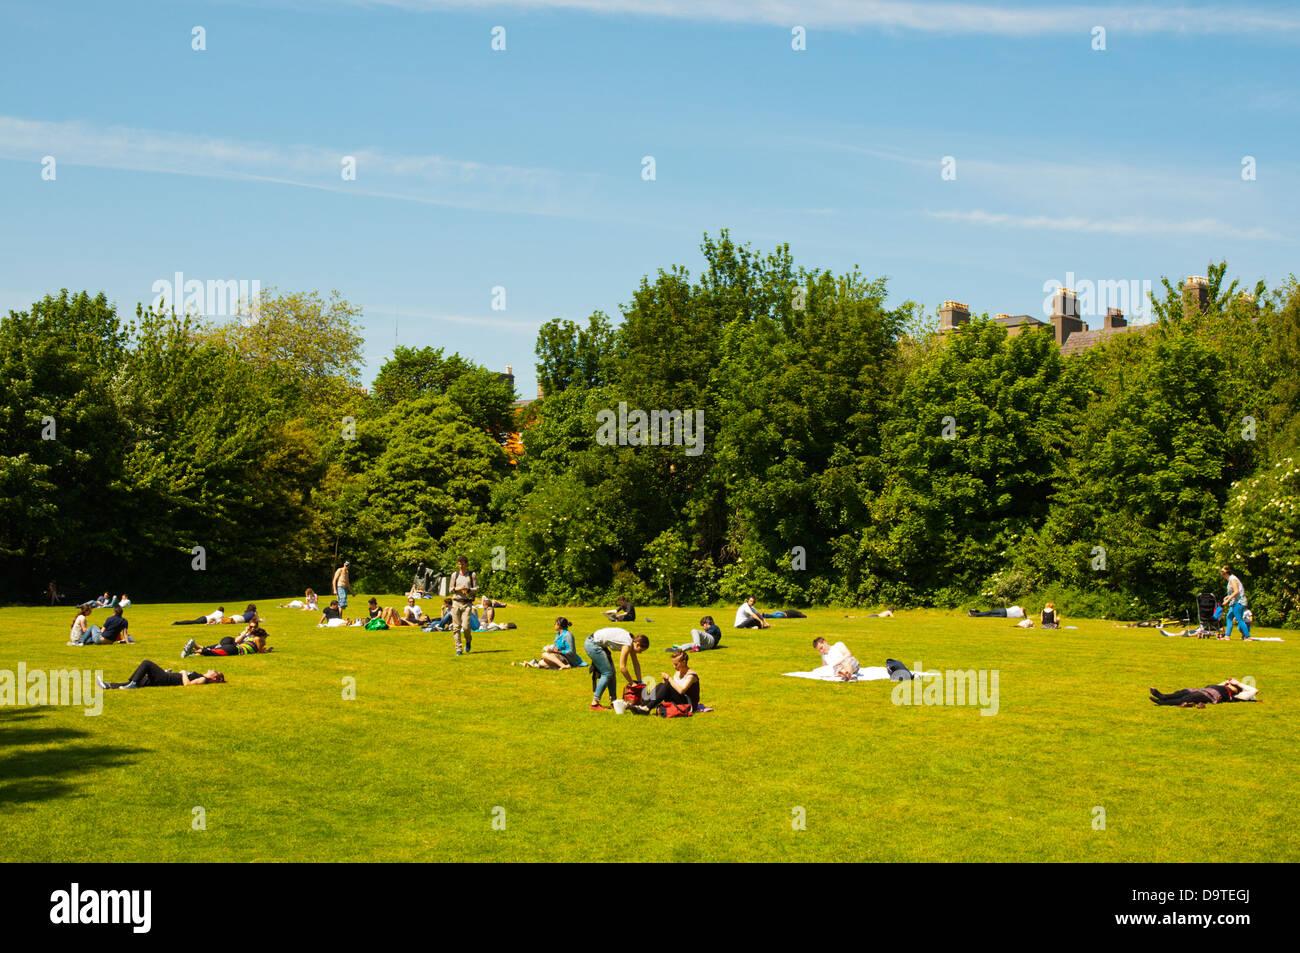 Merrion Square Park central Dublin Ireland Europe - Stock Image